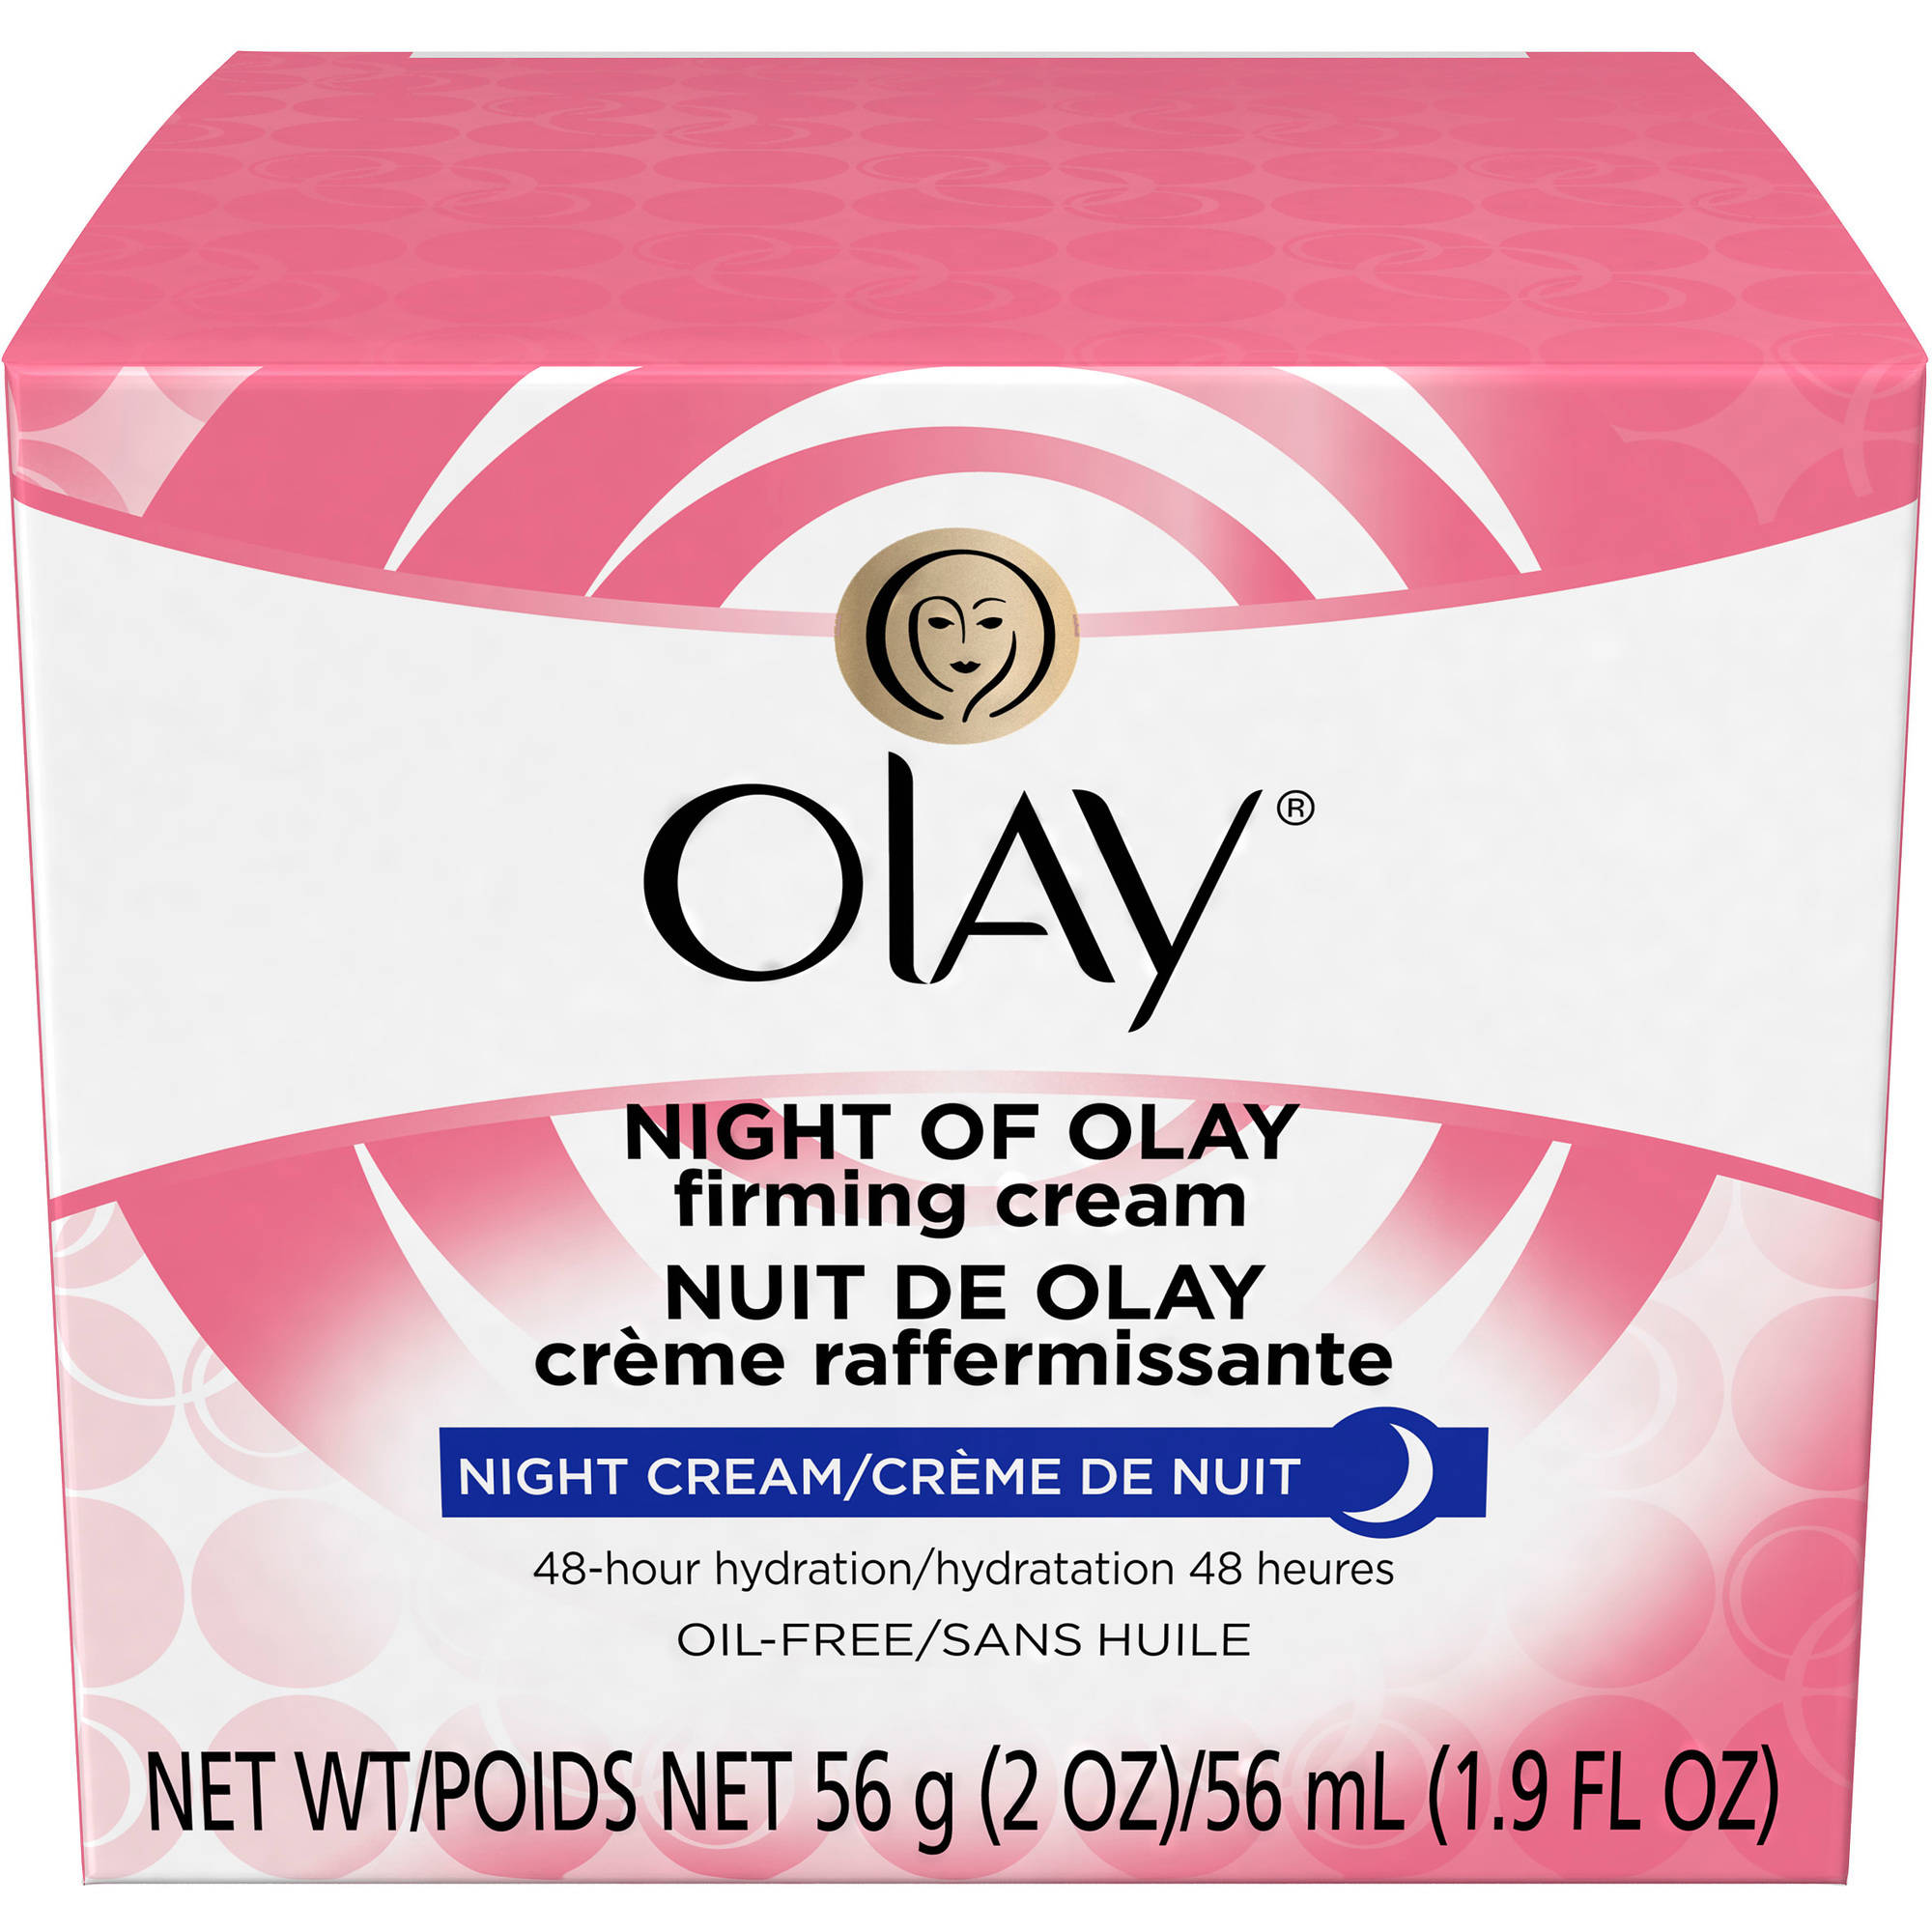 Olay Night Of Olay Firming Facial Moisturizer Cream, 2 oz